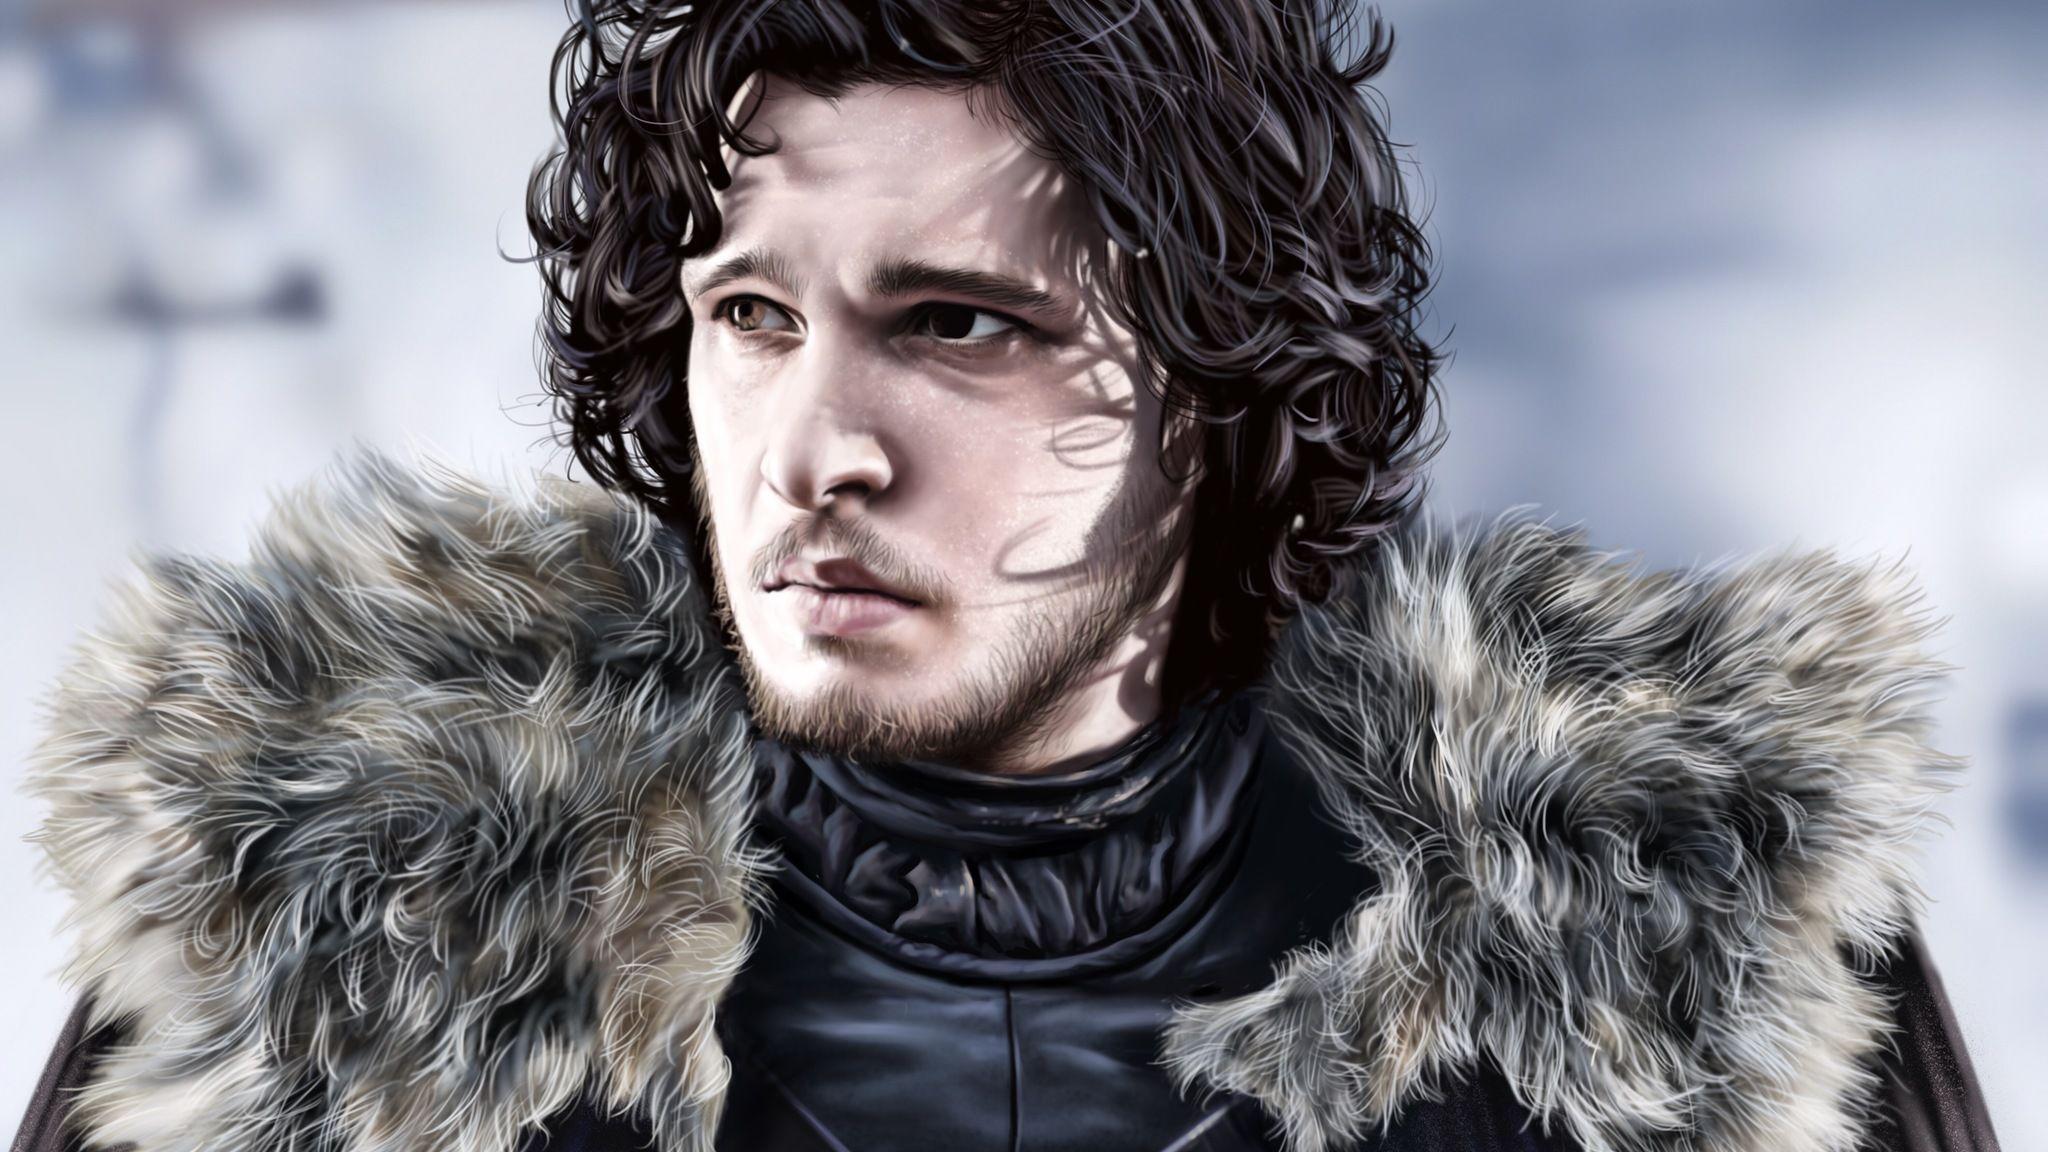 Jon Snow Wallpapers Top Free Jon Snow Backgrounds